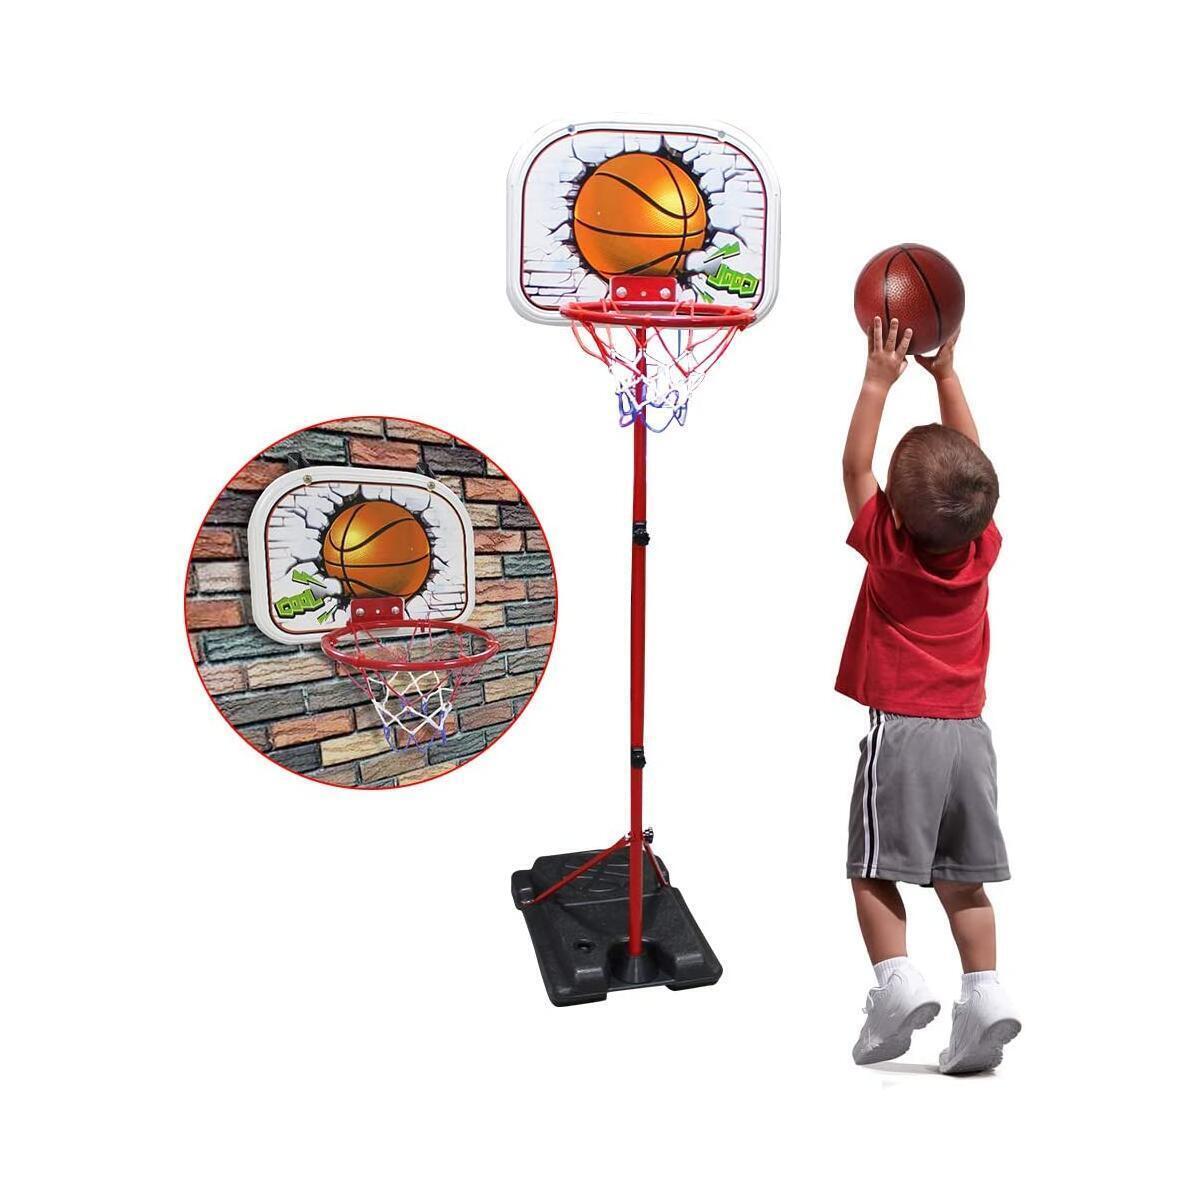 Toddler Basketball Hoop Indoor SOWOW Basketball Hoop for kid Adjustable Basketball Set outdoor toys for toddler age 3 basketball goal toys for 2 year old boy Kid Mini Basketball Hoop for Toddler